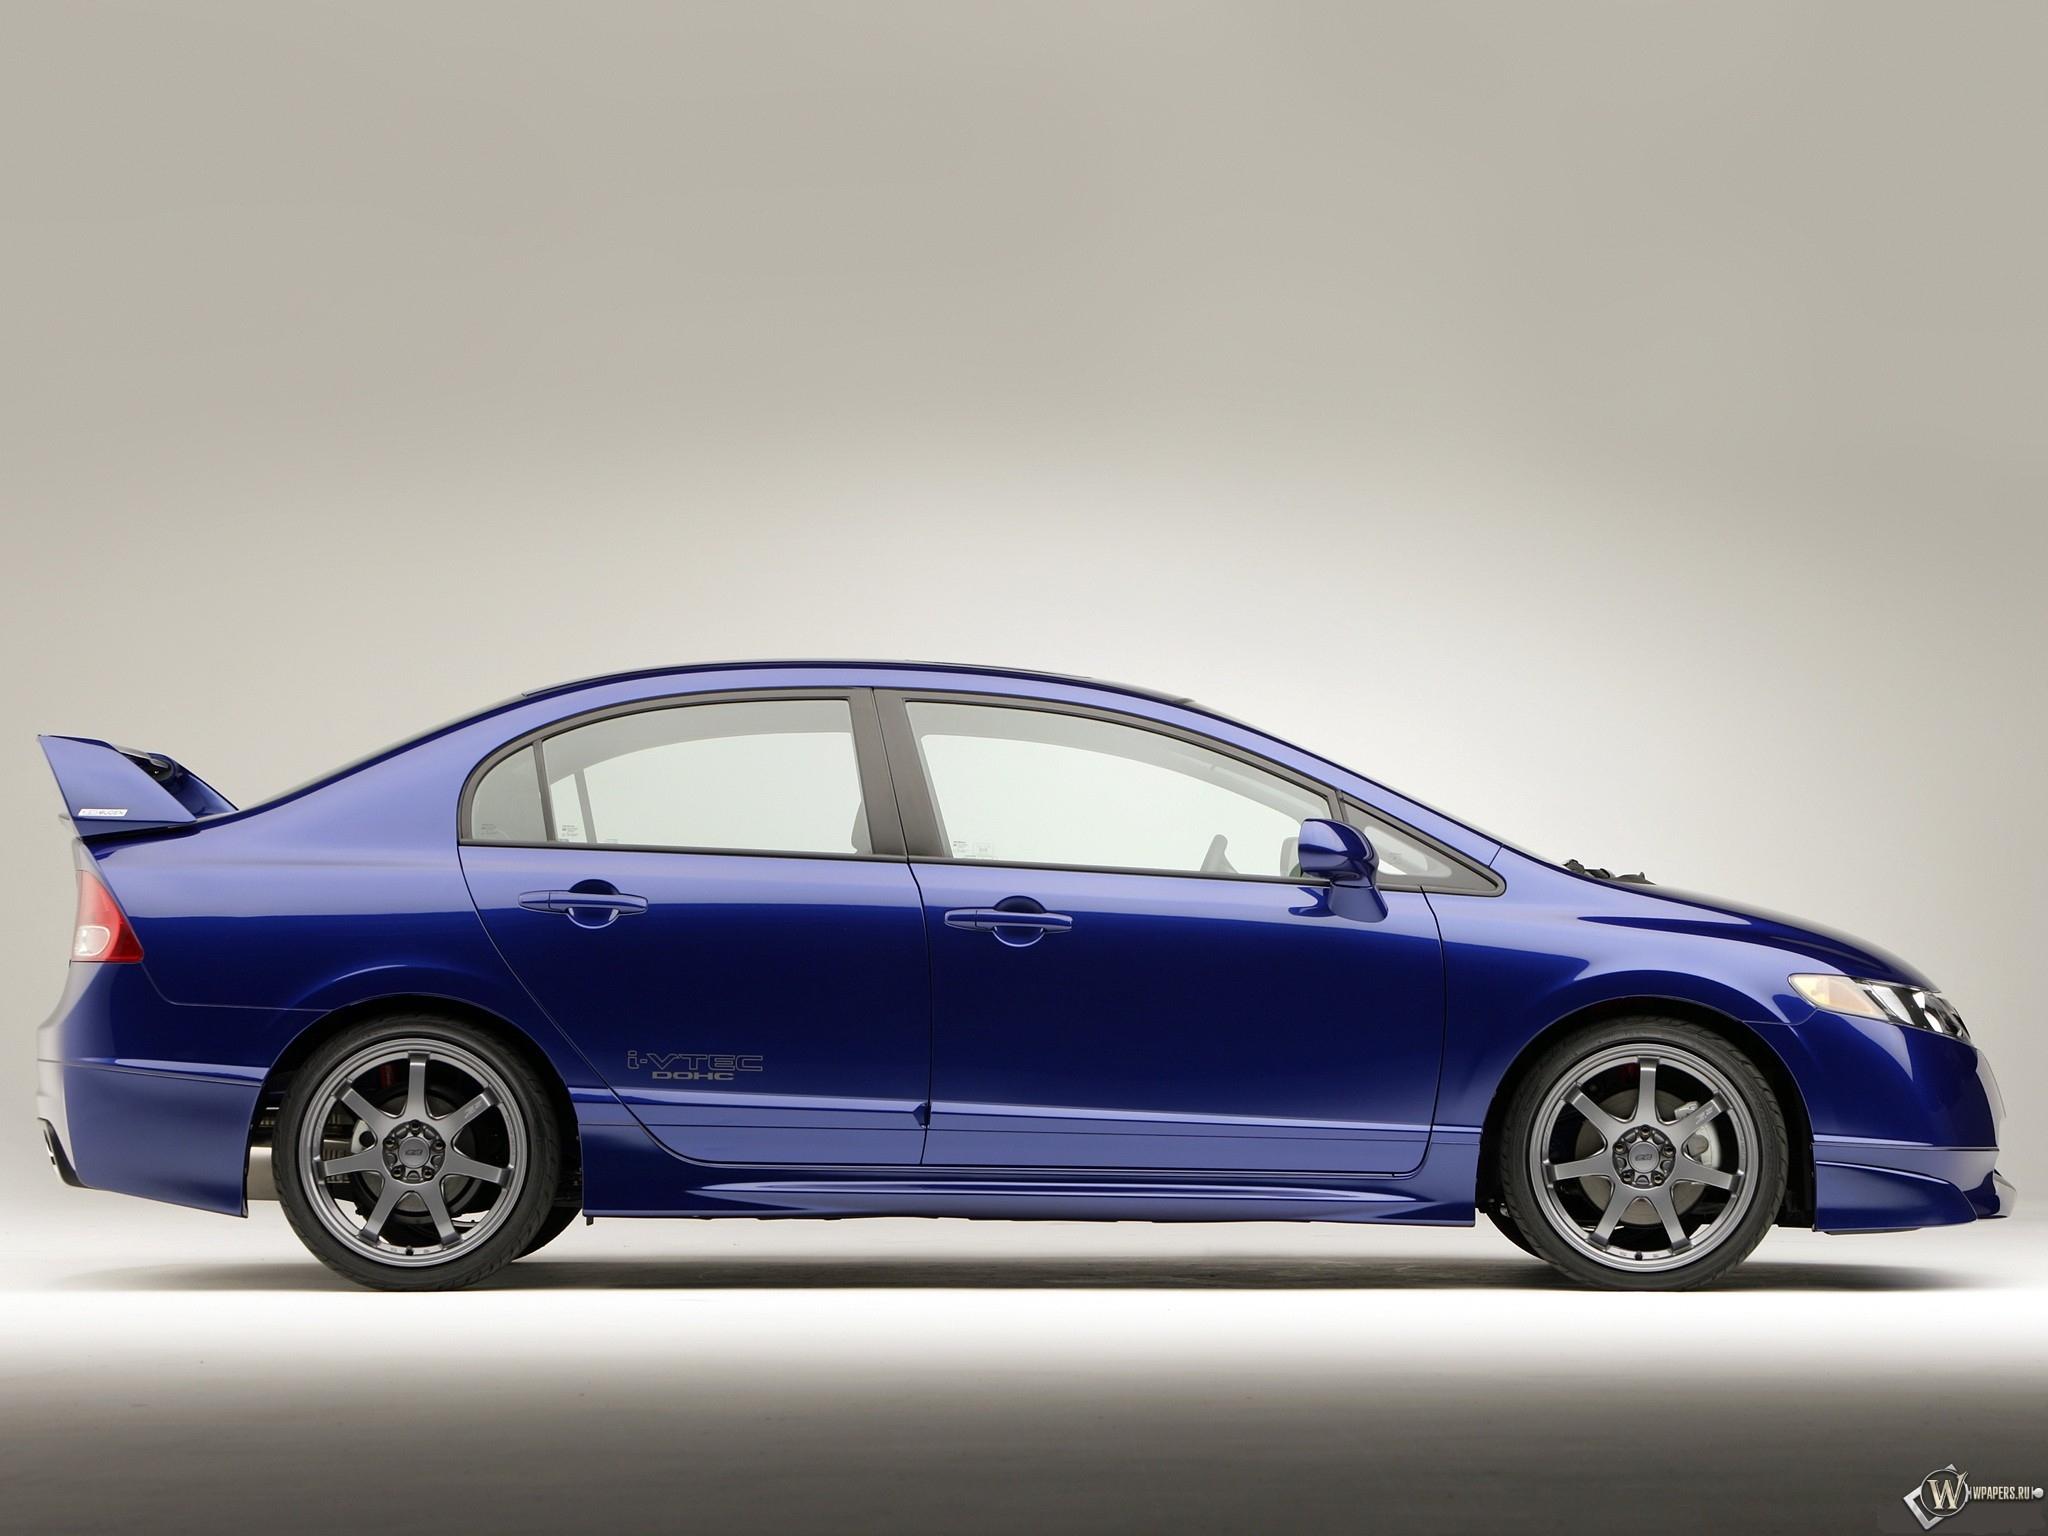 Honda Mugen Civic Si 2048x1536